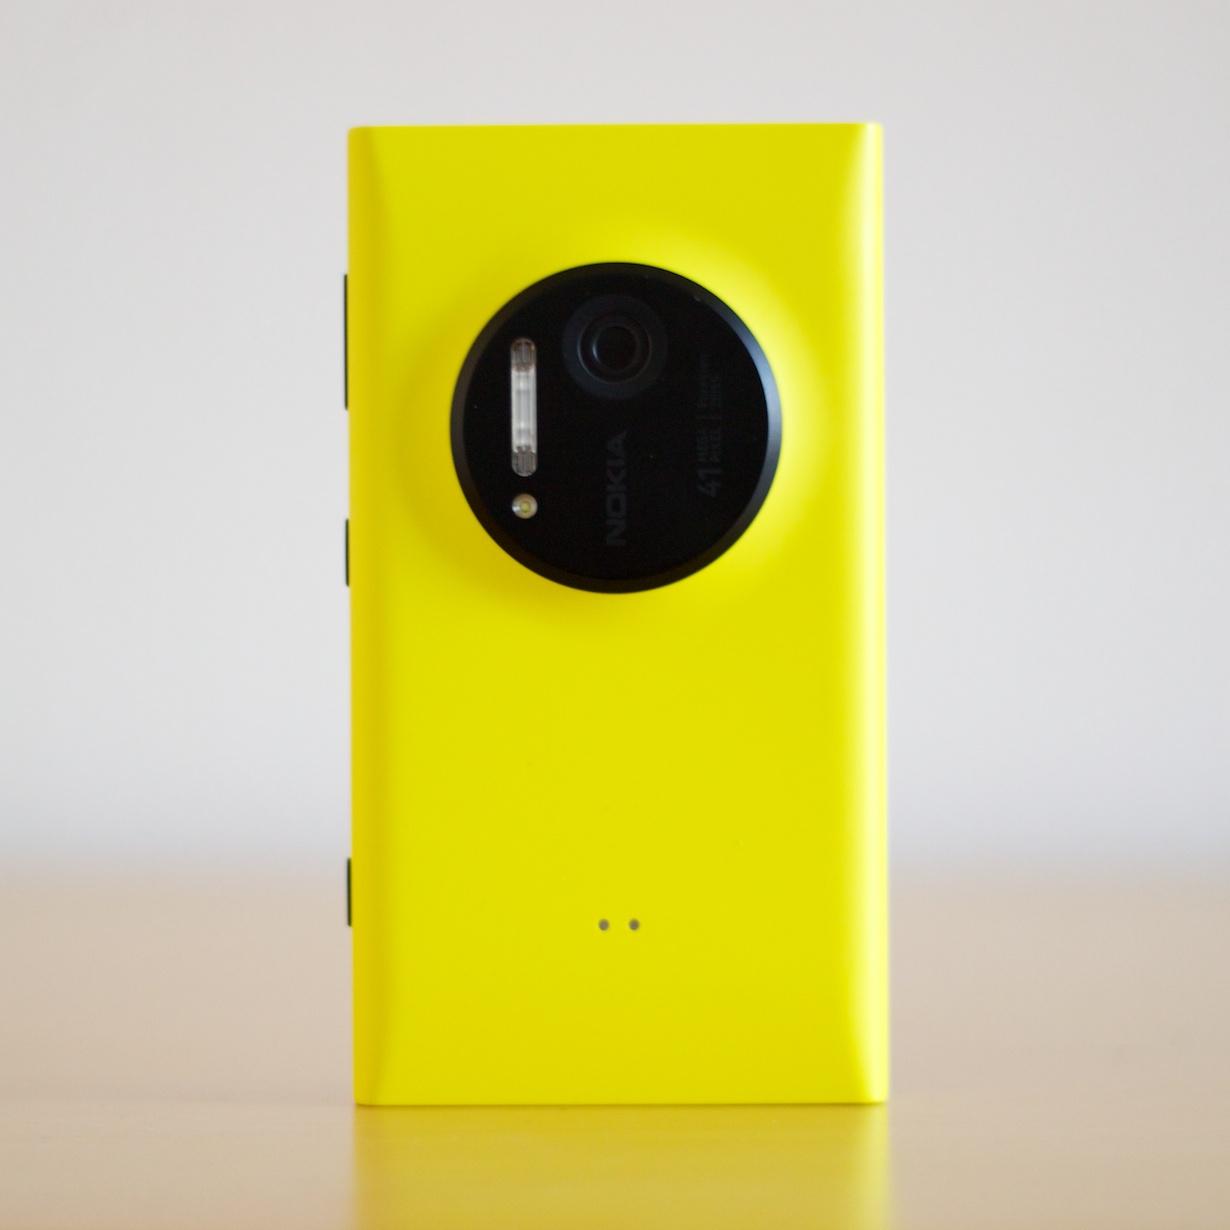 Lumia 1020 Mit Vertrag